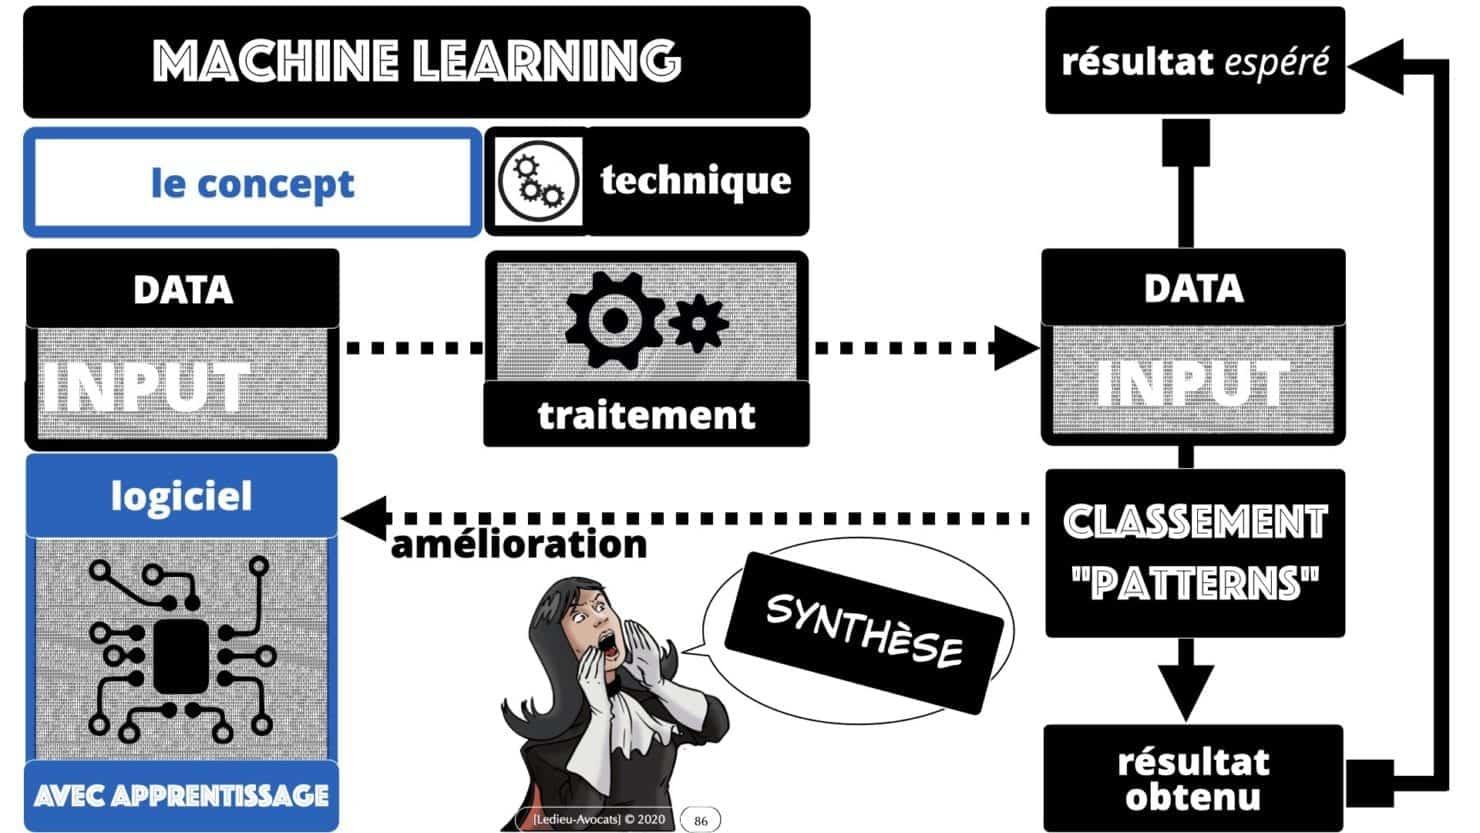 307 Intelligence artificielle-machine-learning-deep-learning-base de données-BIG-DATA *16:9* Constellation ©Ledieu-Avocat-13-10-2020.086